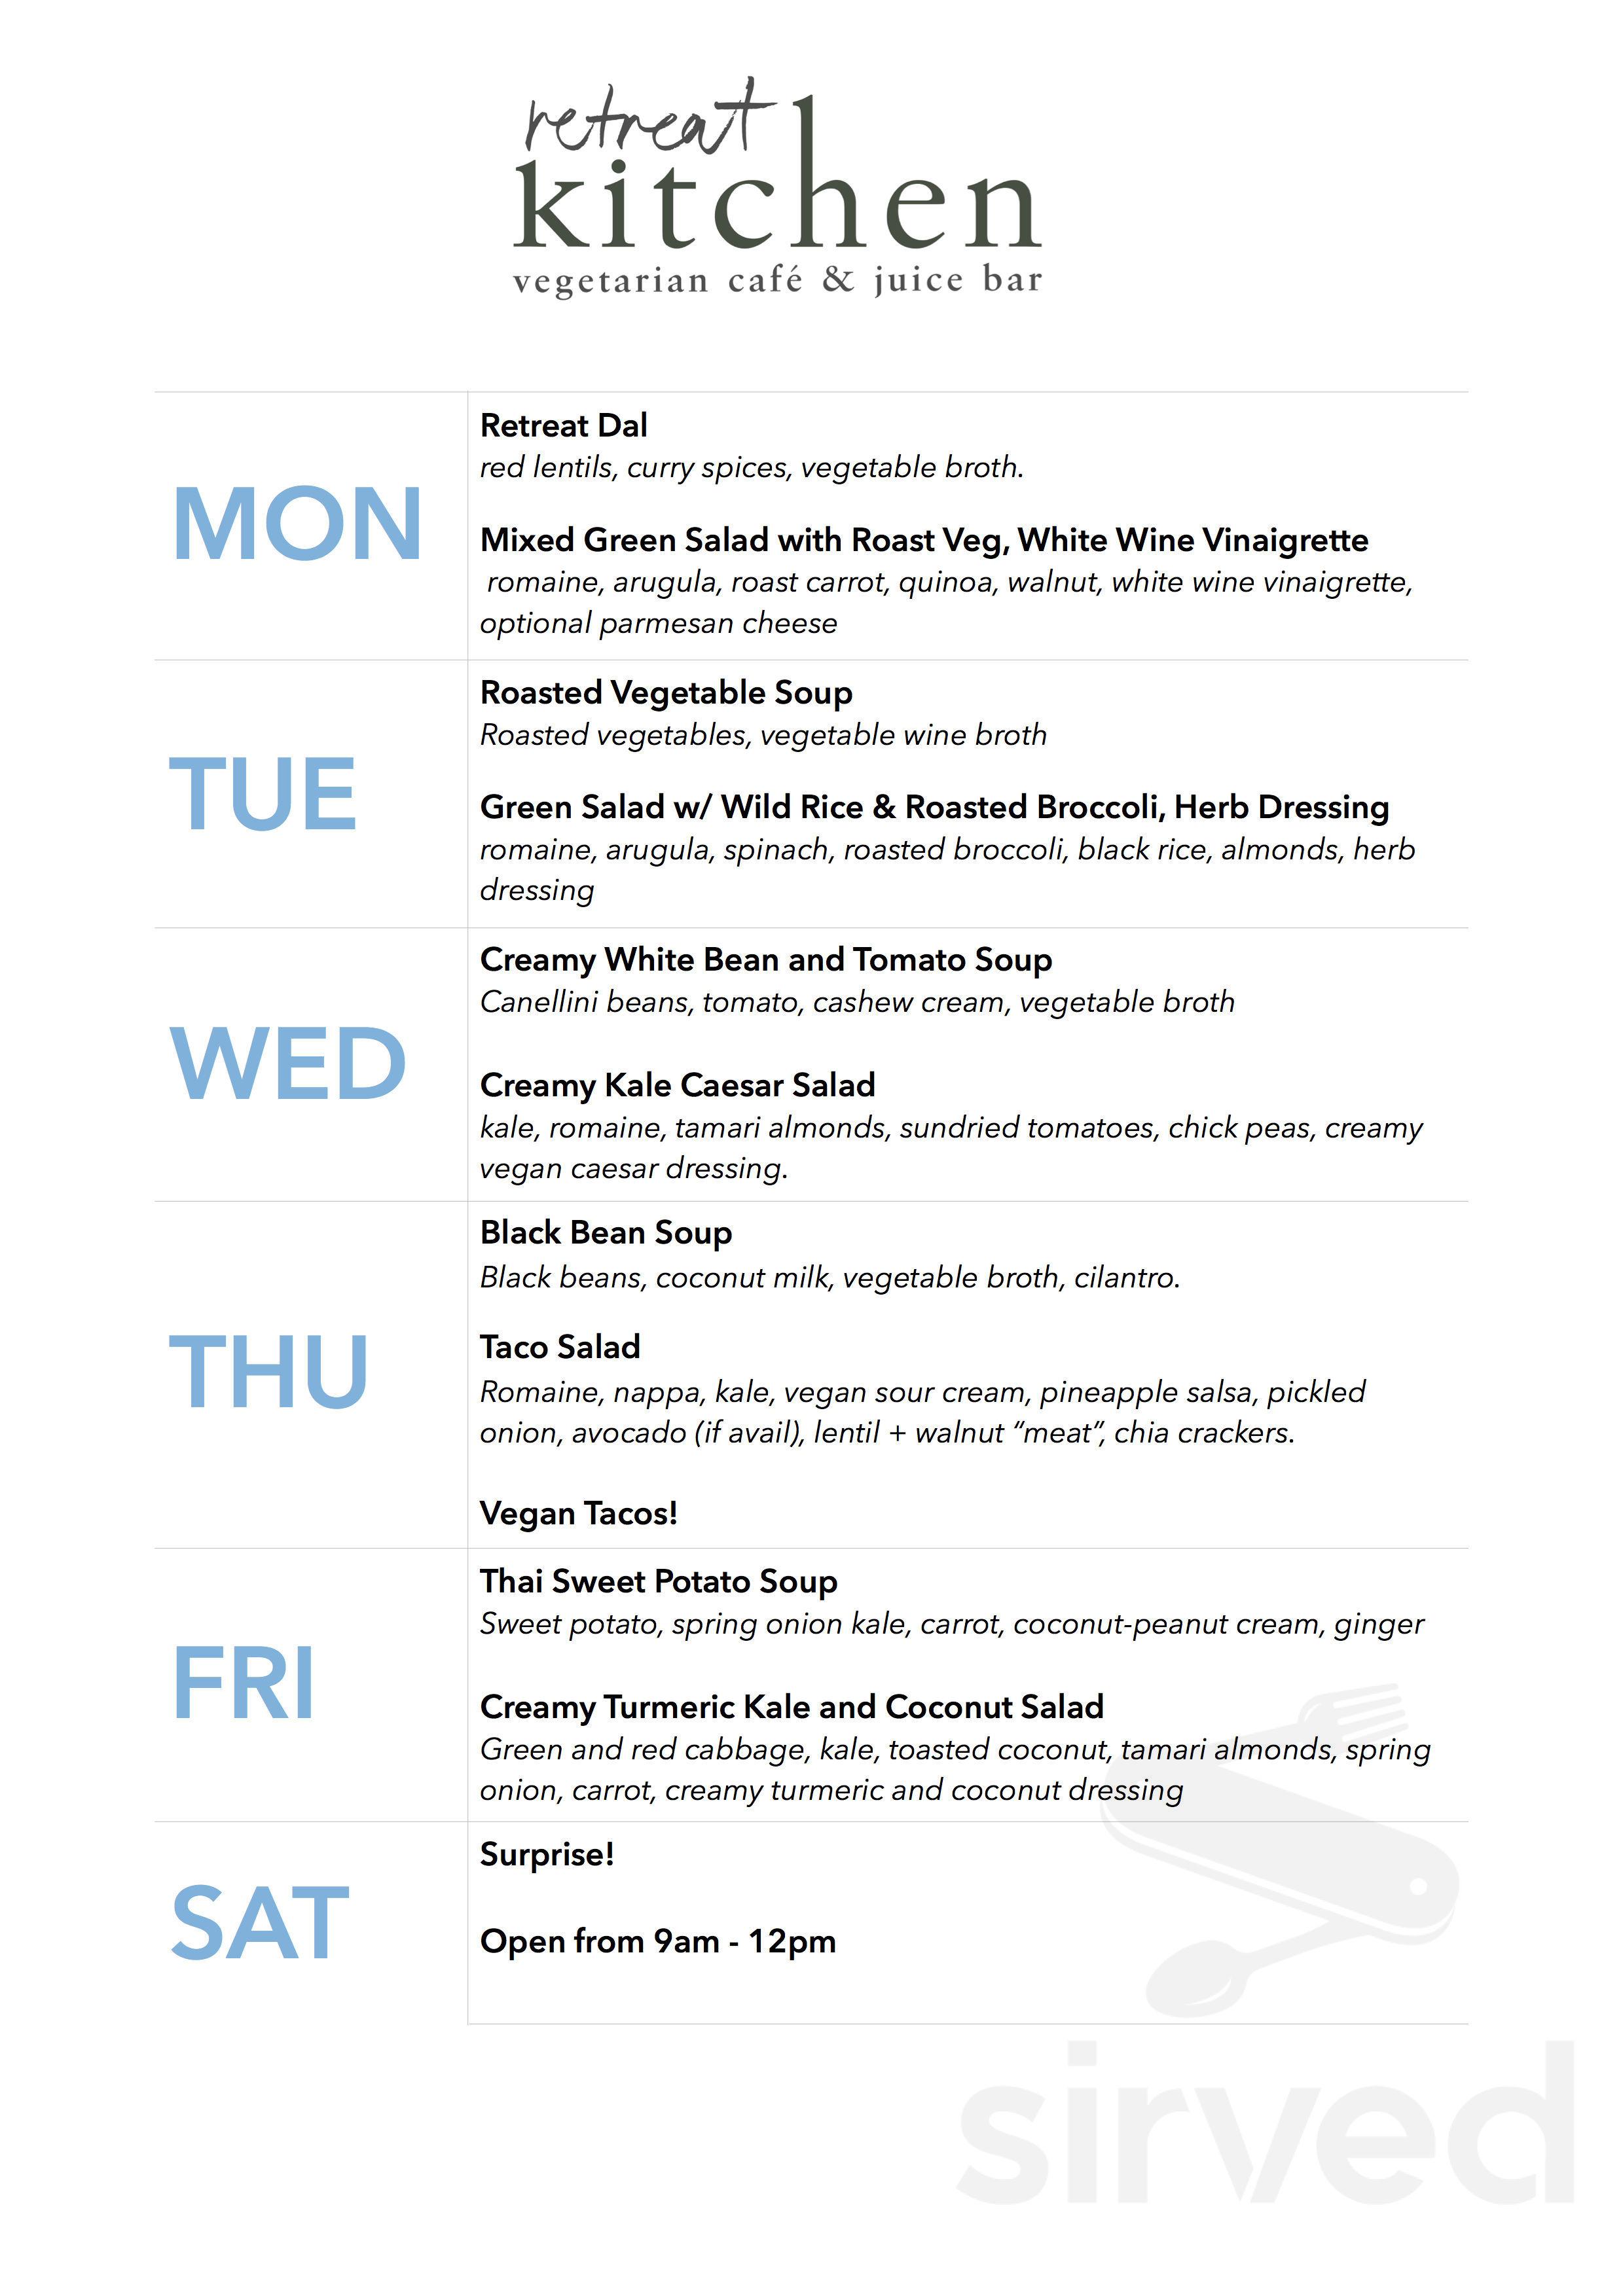 Retreat Kitchen Menu In Grace Bay Tkca 1zz Grace Bay Tkca 1zz Turks And Caicos Islands